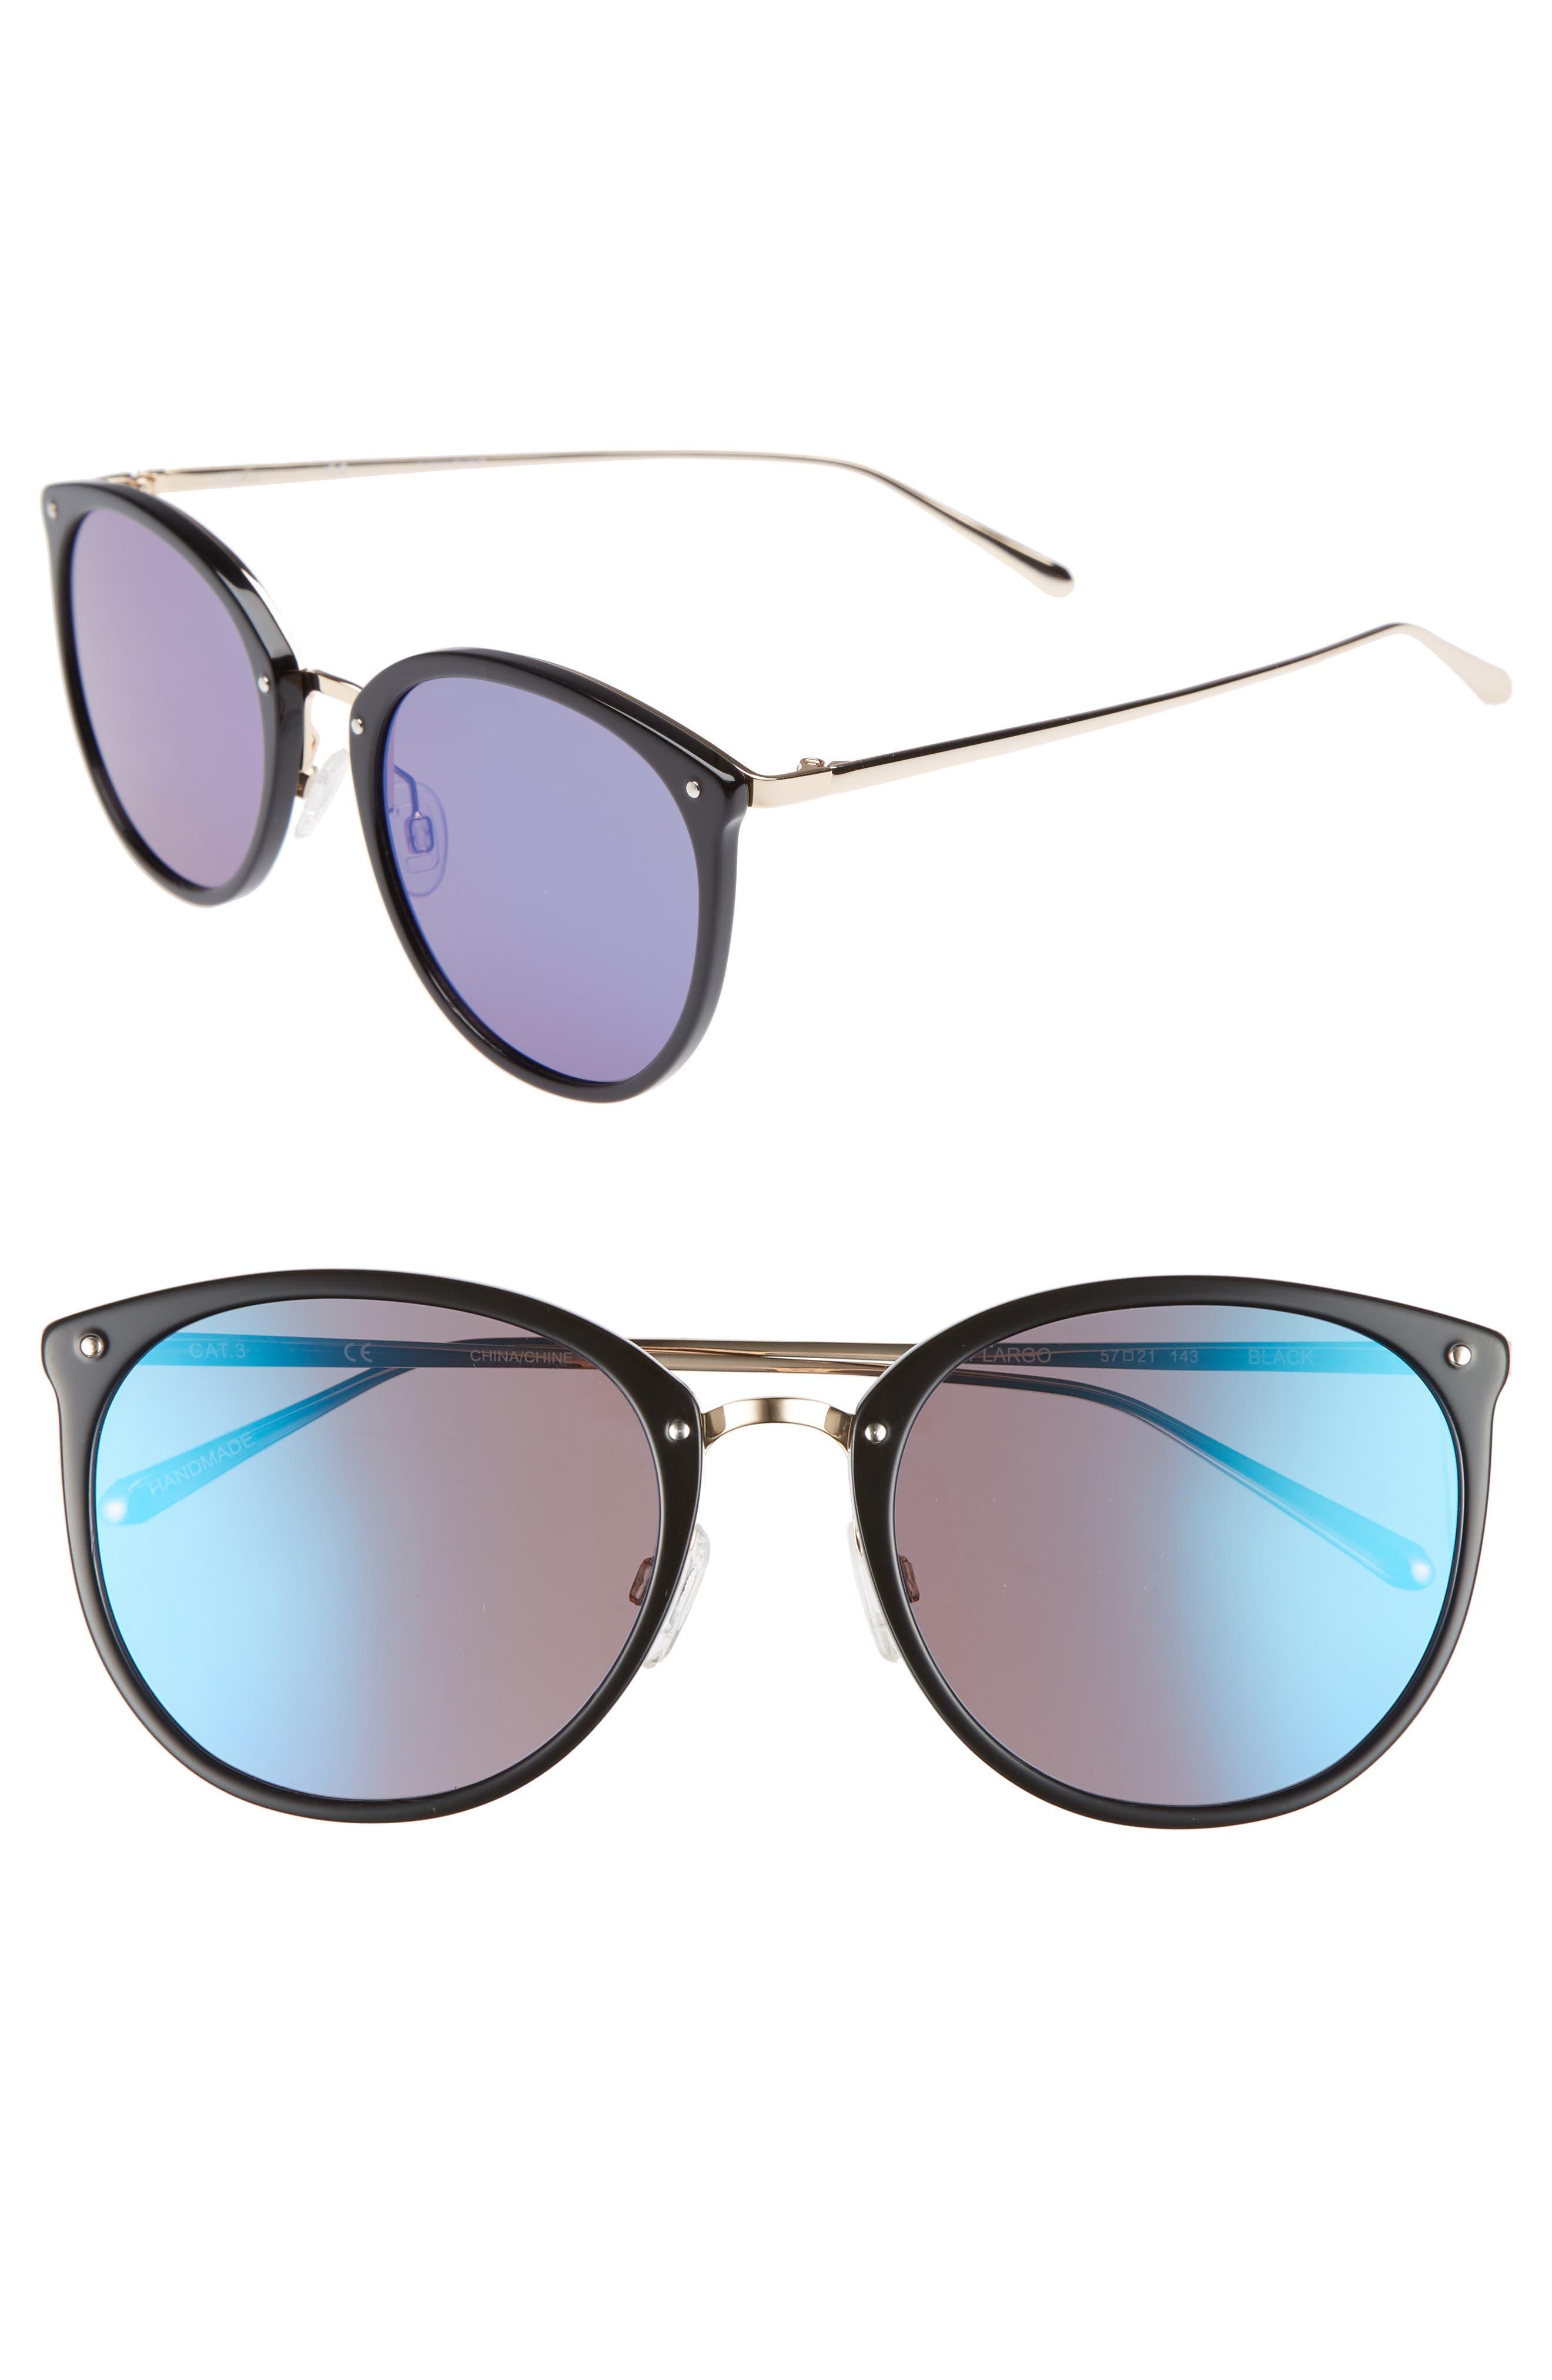 Key Largo 57mm Sunglasses,                             Main thumbnail 1, color,                             001